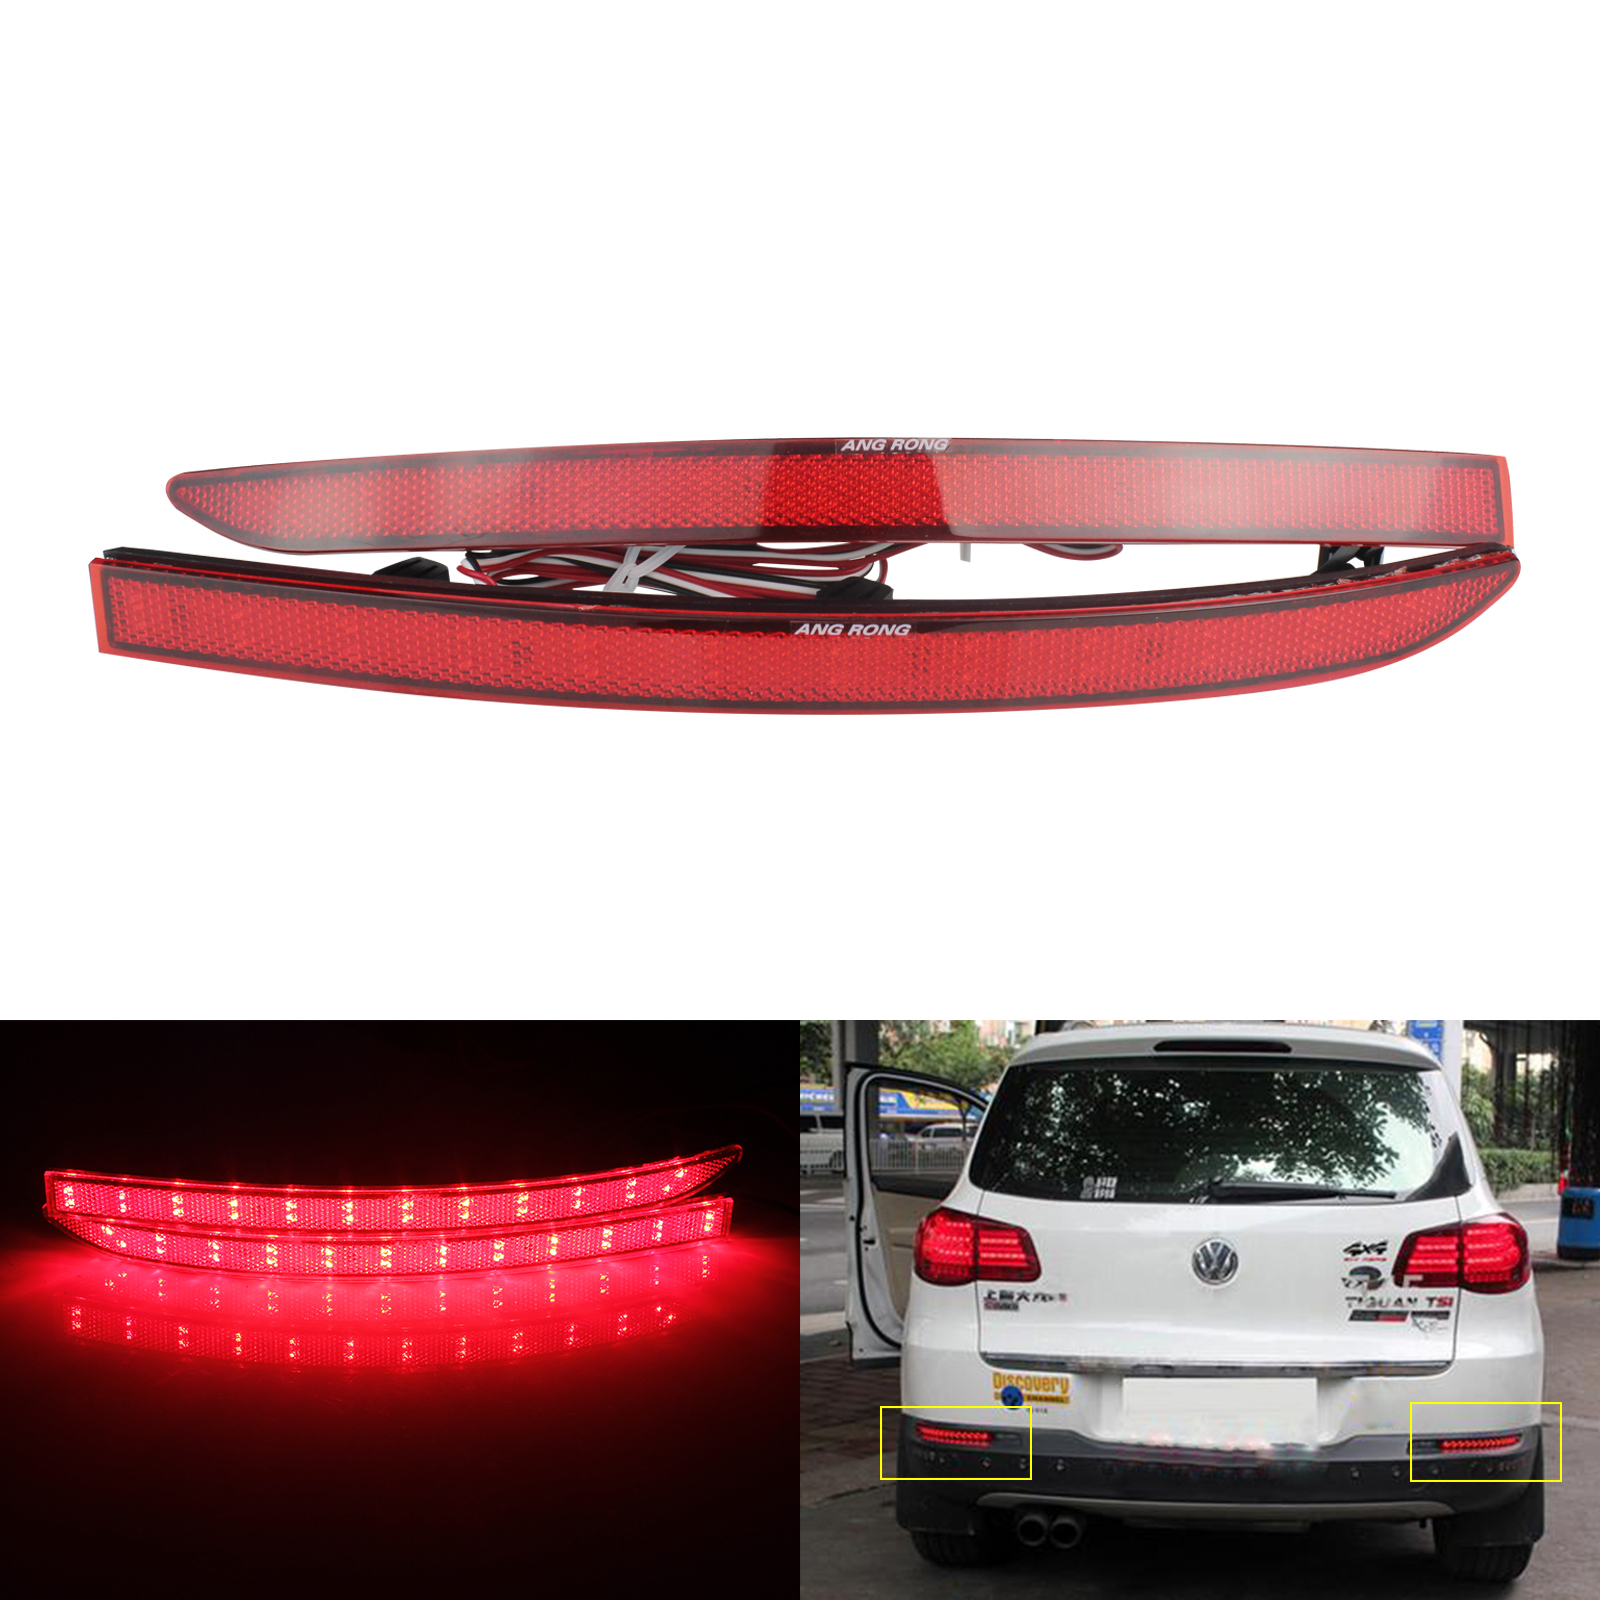 2x Red Lens Rear Bumper Reflector LED Tail Stop Brake Light For 08-15 VW Tiguan